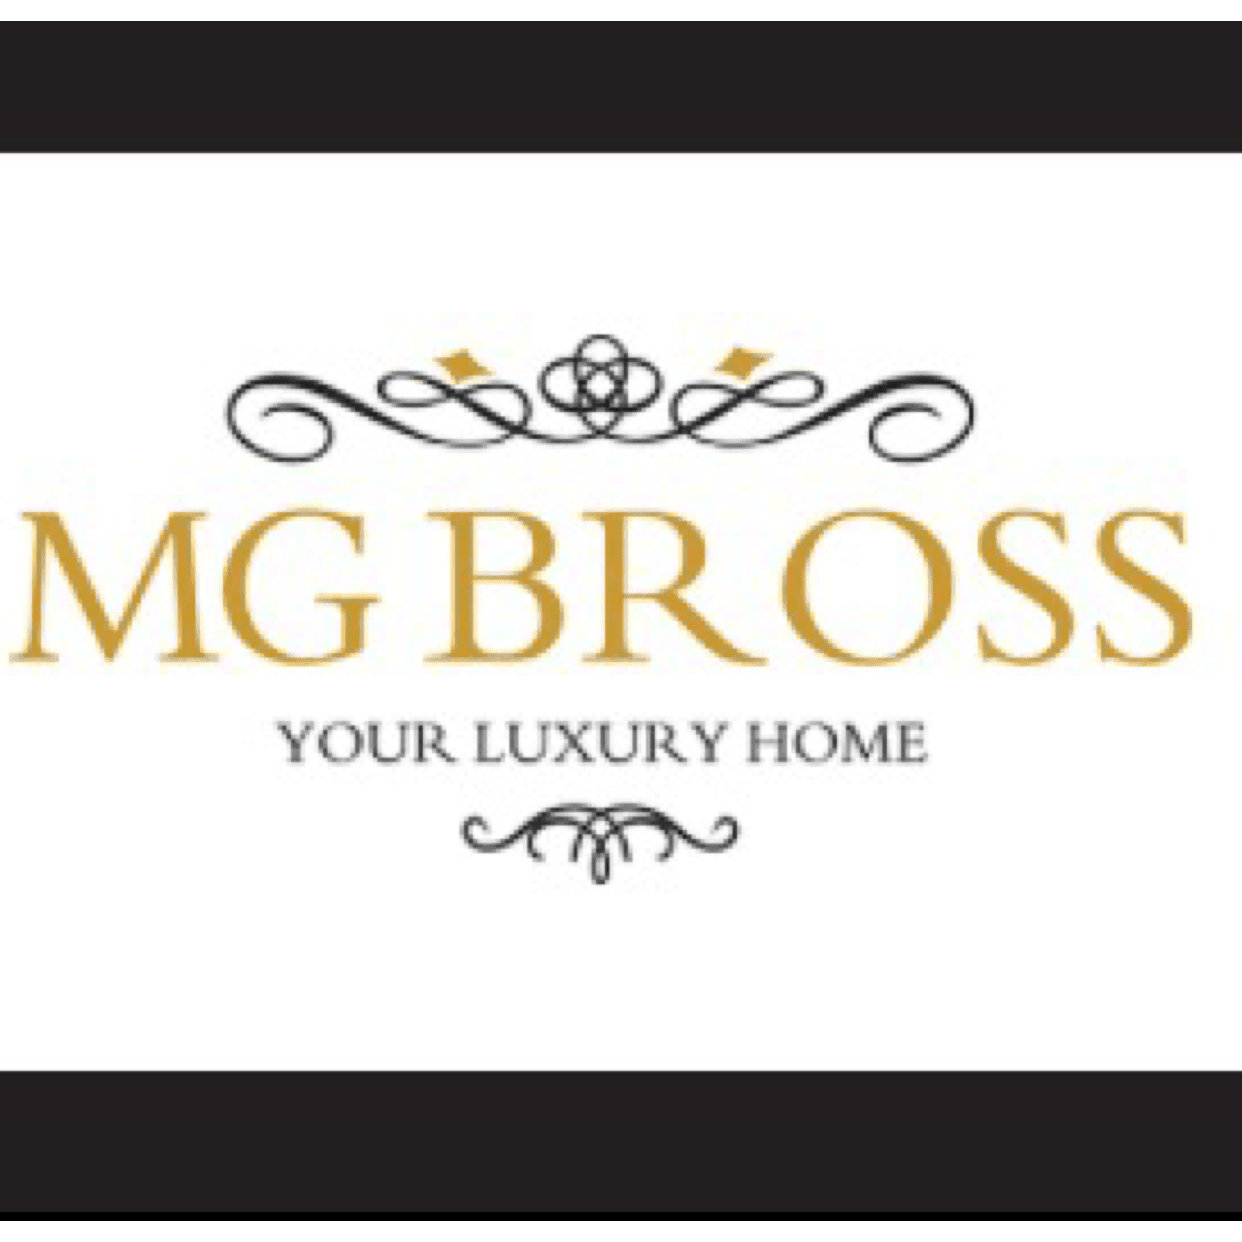 MG Bross Ltd - London, London SE1 9SS - 07553 887711 | ShowMeLocal.com